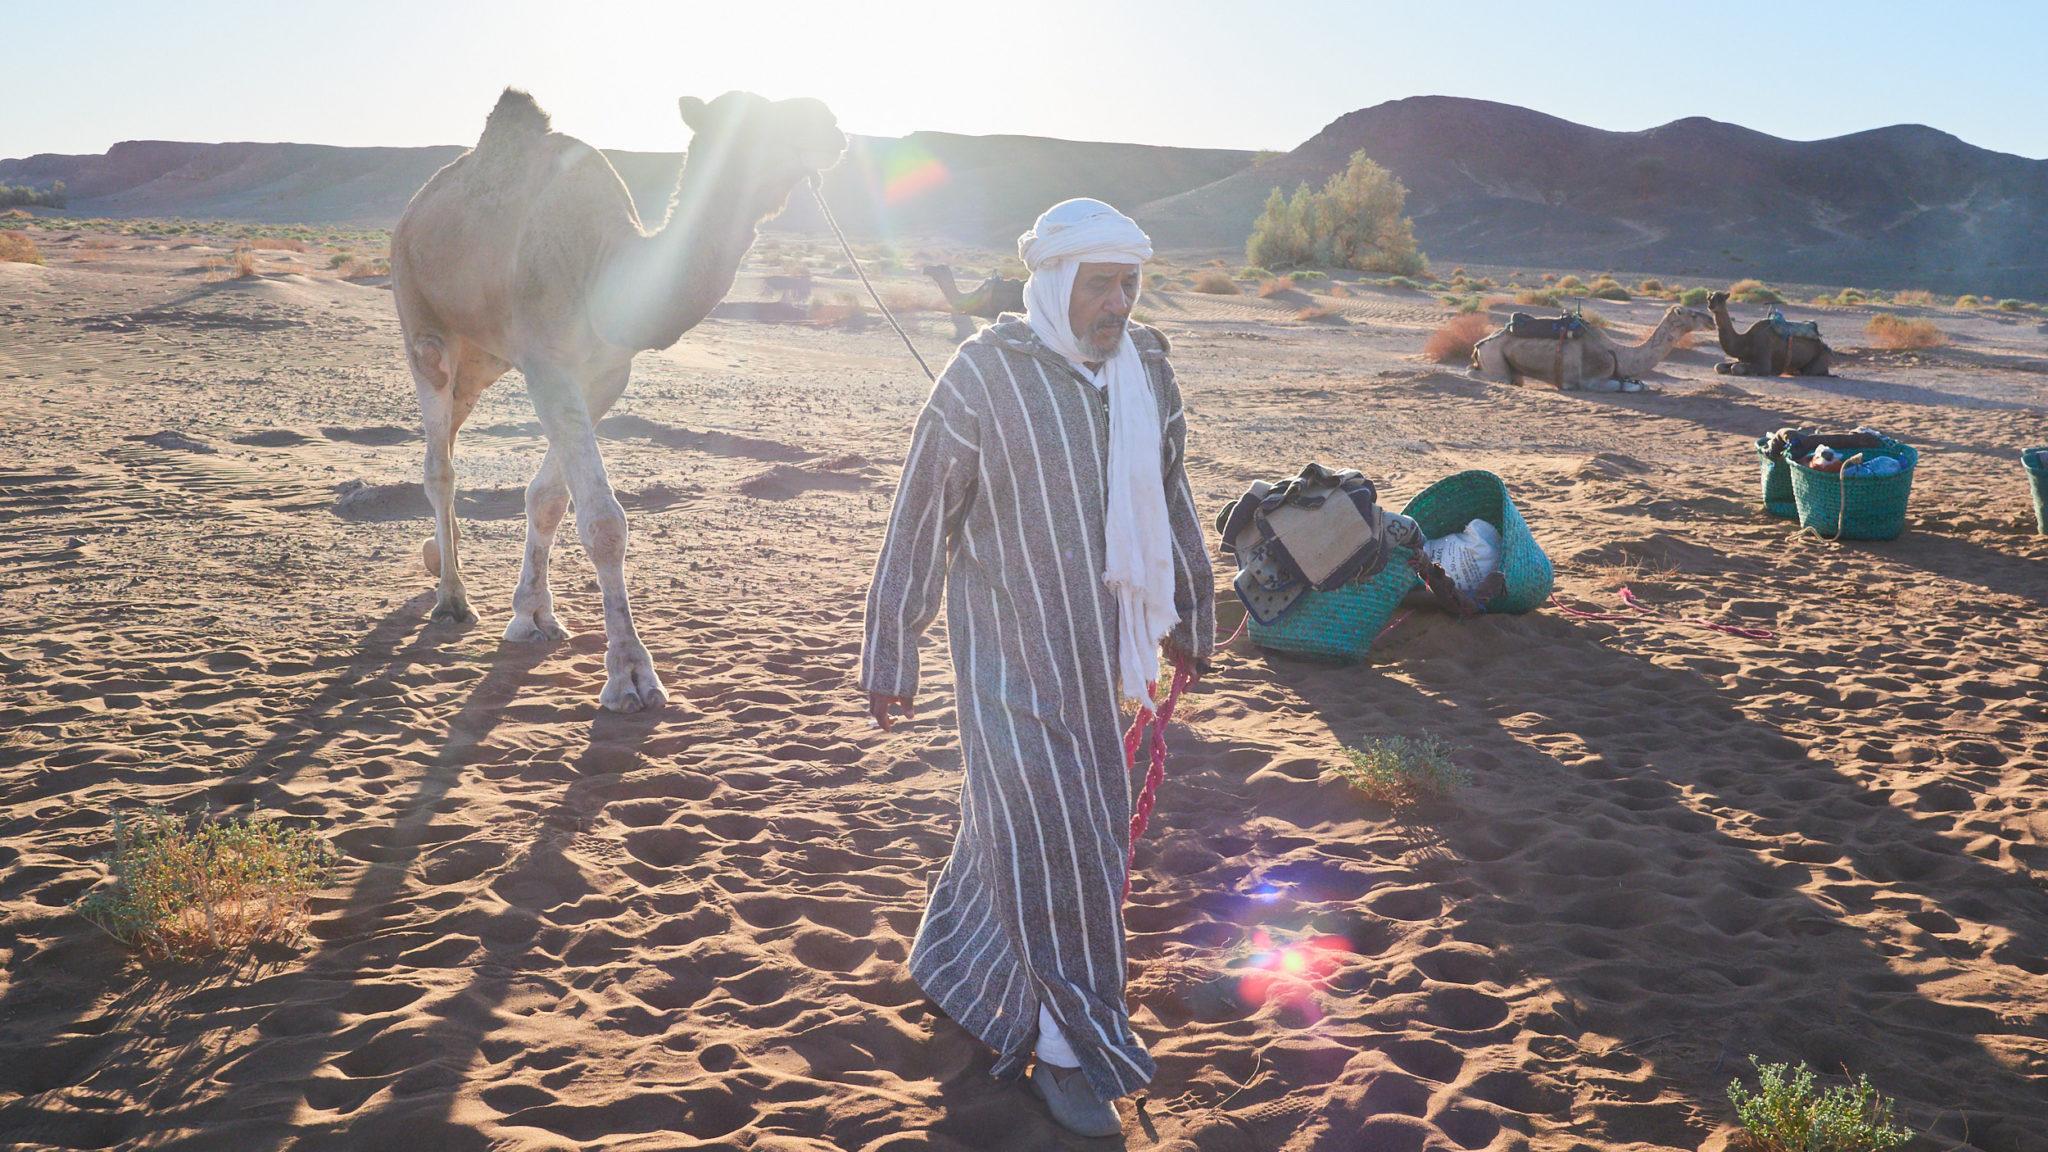 podpera marokko reportage 2017 b012970